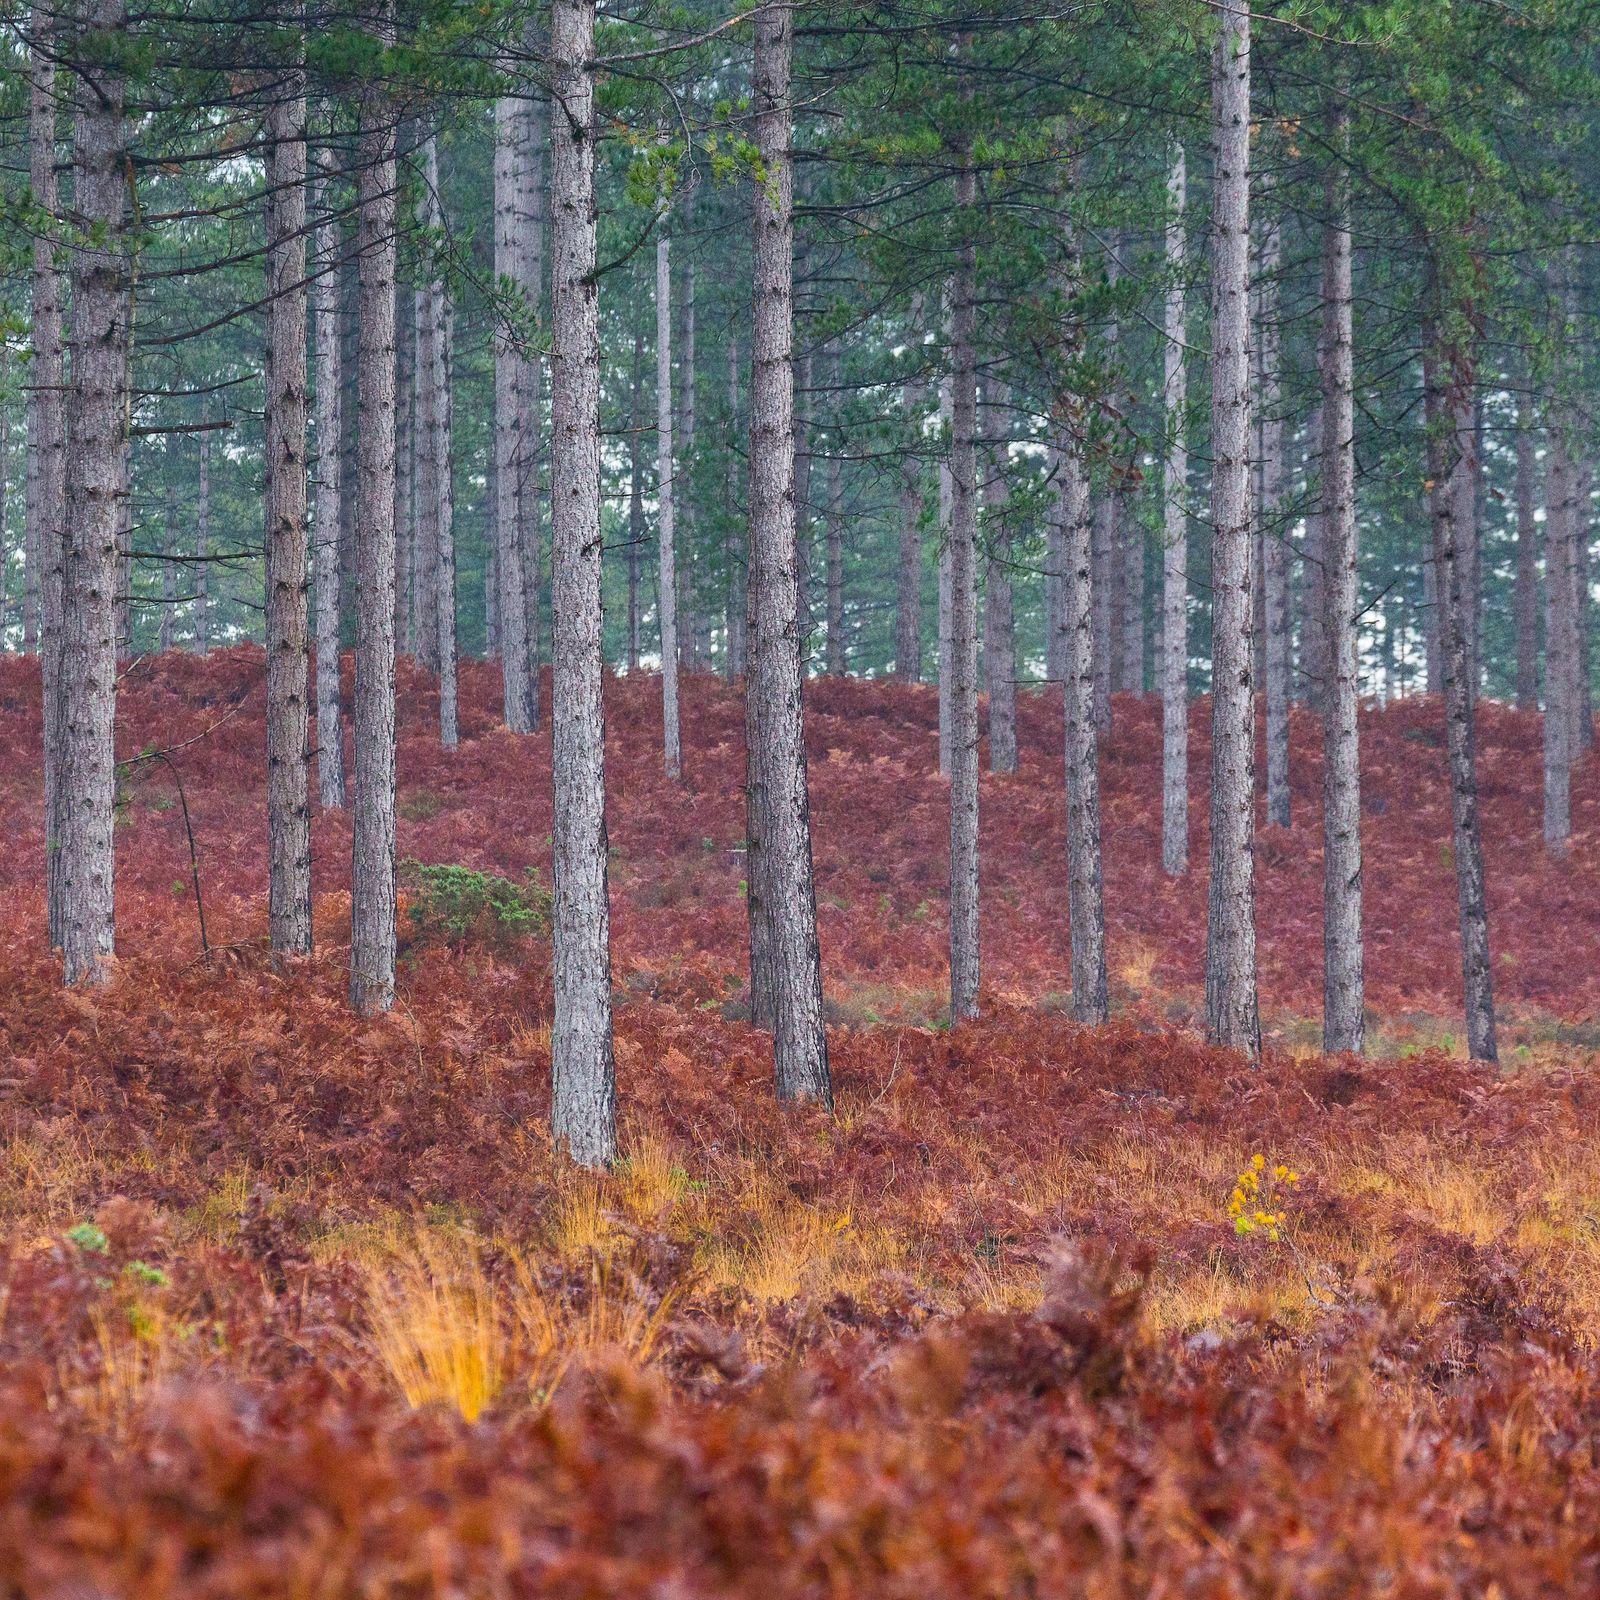 Rempstone Heath, Purbeck, Dorset.